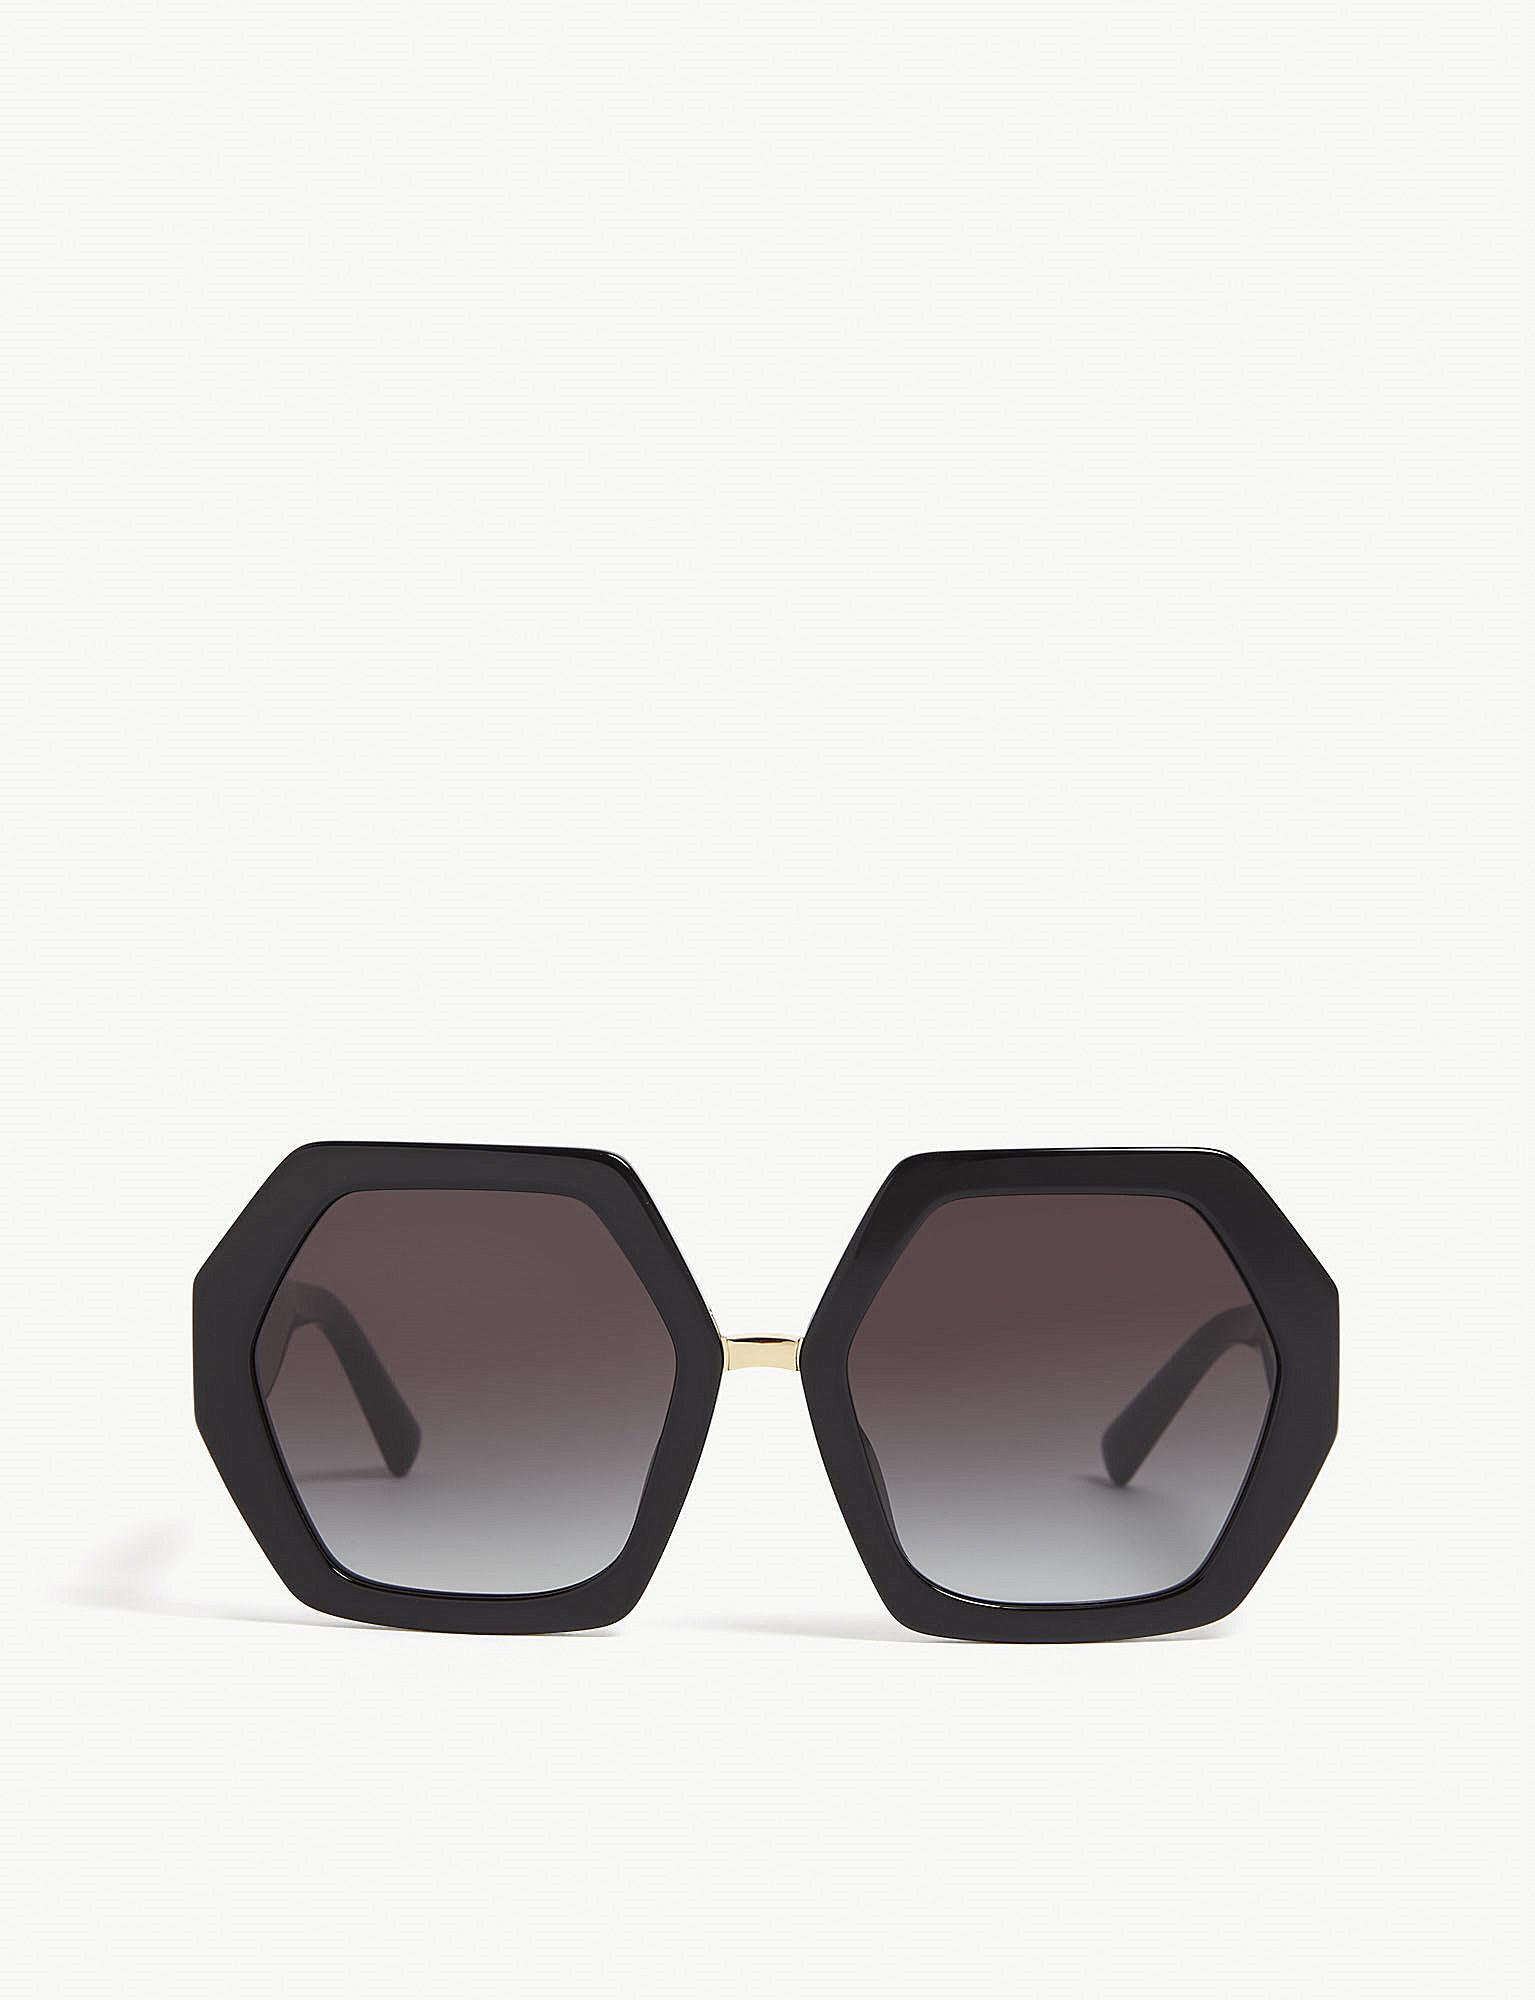 80236d78bcb4a Valentino Va4053 Irregular-frame Sunglasses in Black - Lyst